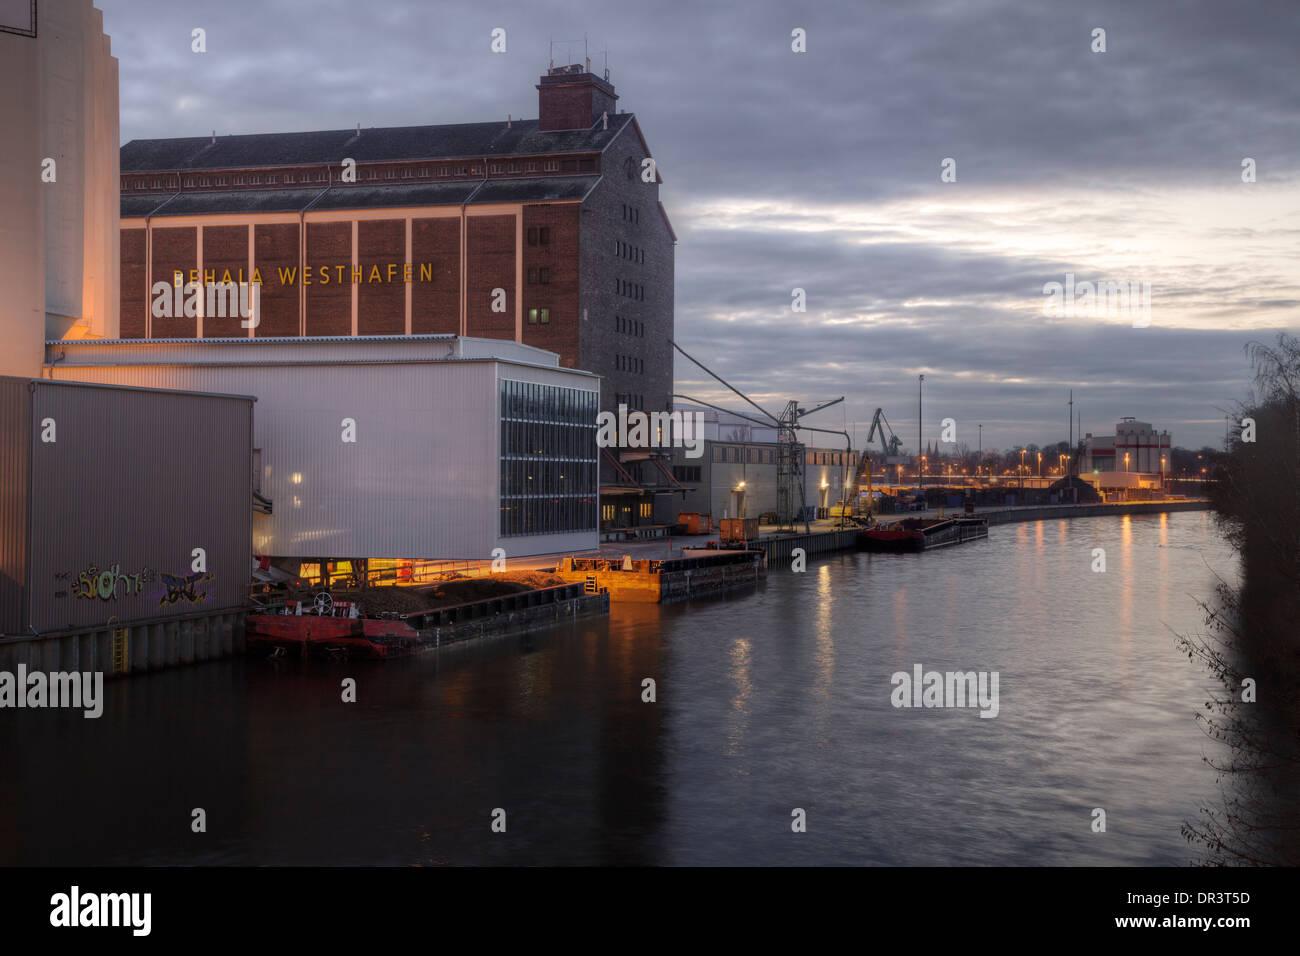 Behala Westhafen, Berlin, Germany Stock Photo